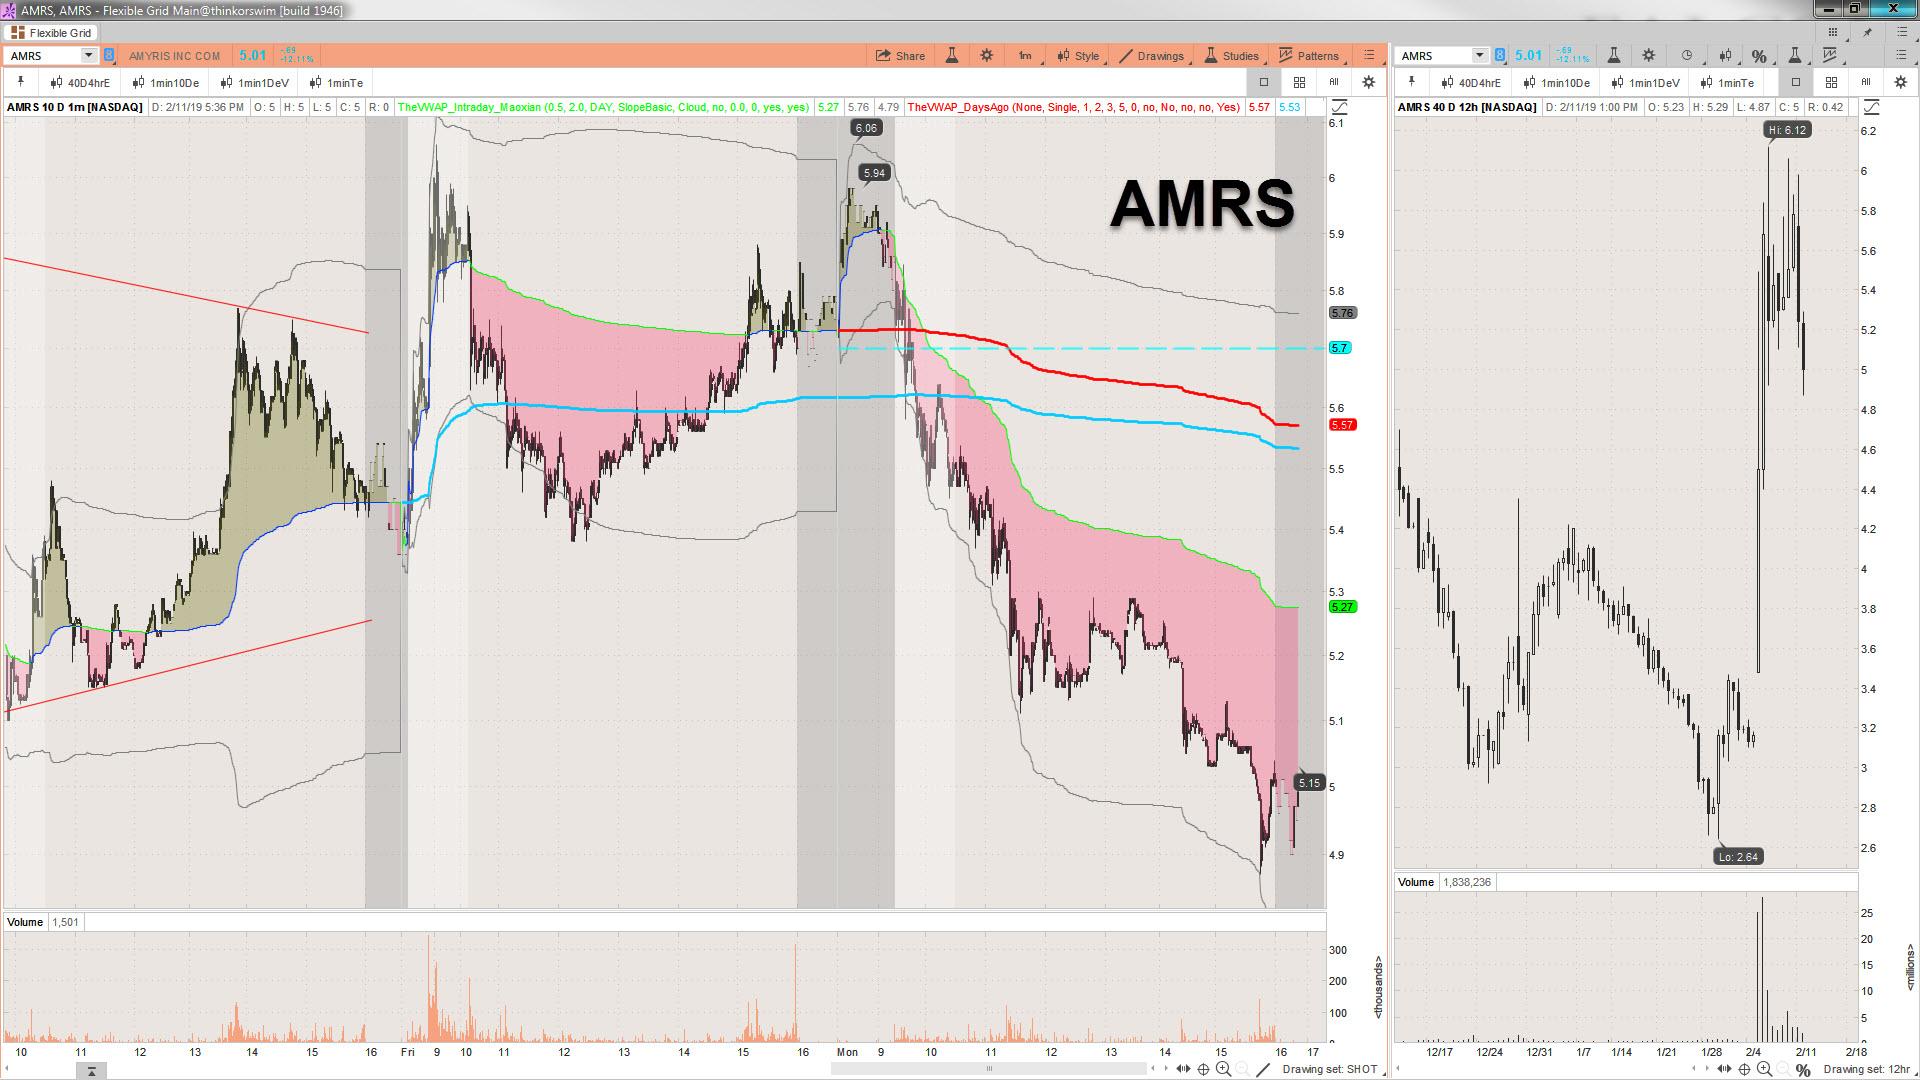 2019-02-11_17-36-17 AMRS.jpg